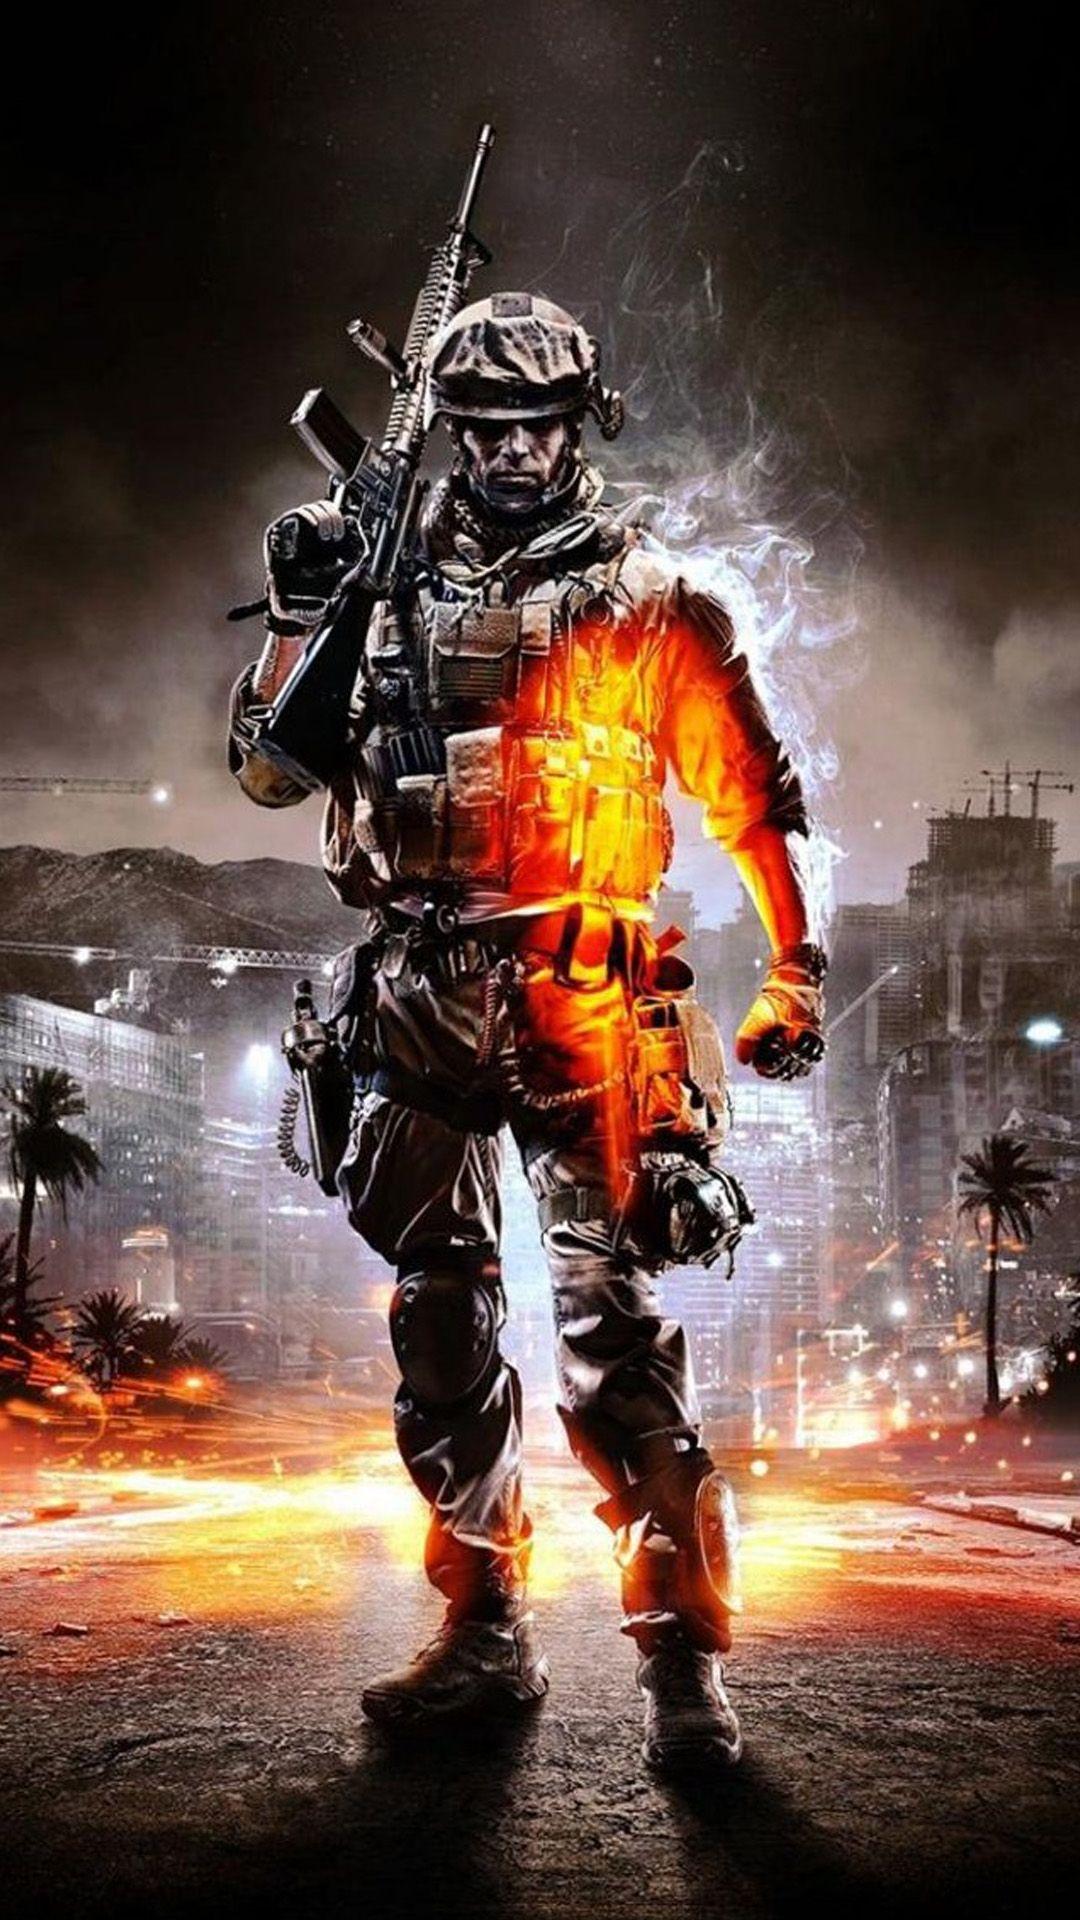 Image Result For Call Of Duty Ghosts Mobile Wallpaper Askeri Resimler Telefon Duvar Kagitlari